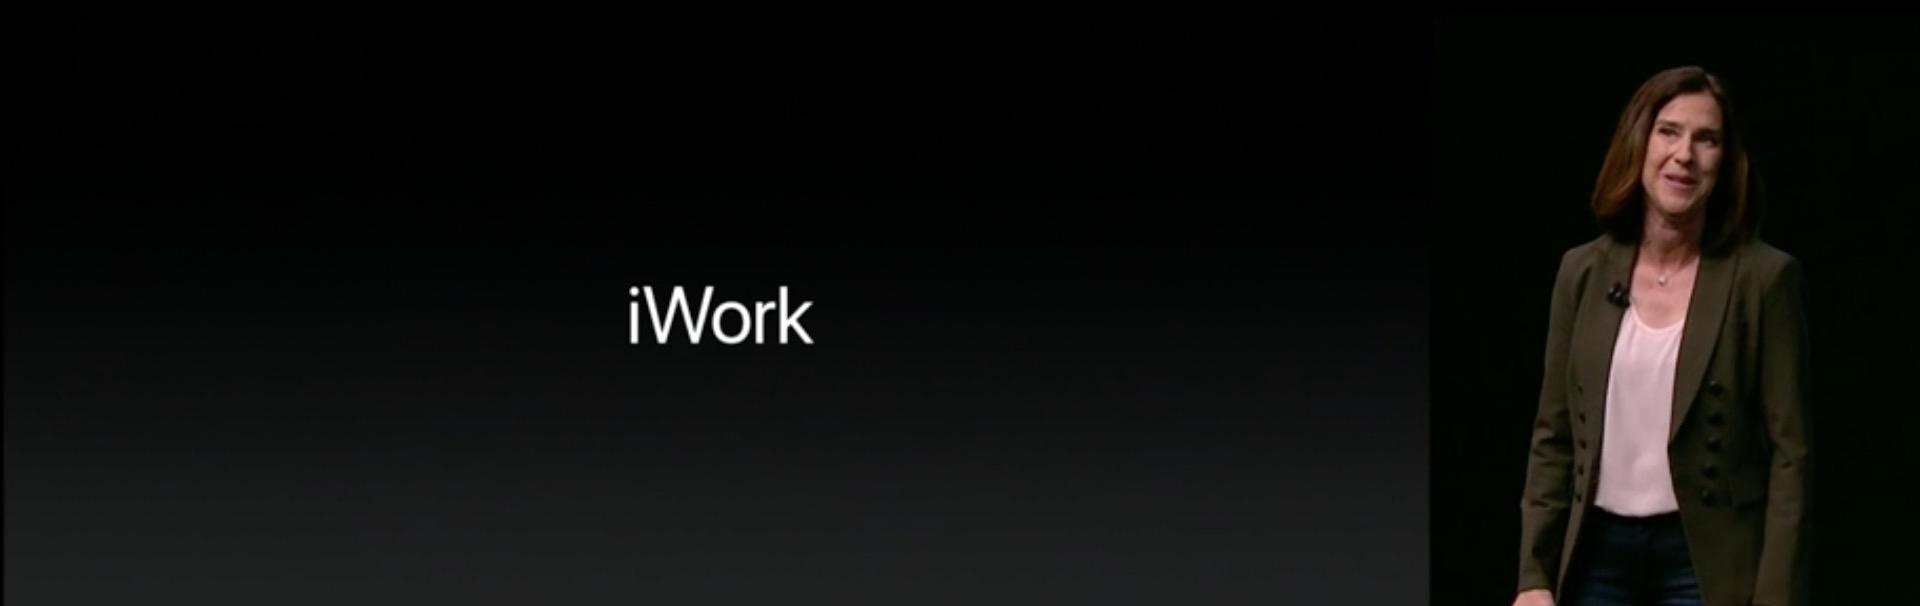 iwork_